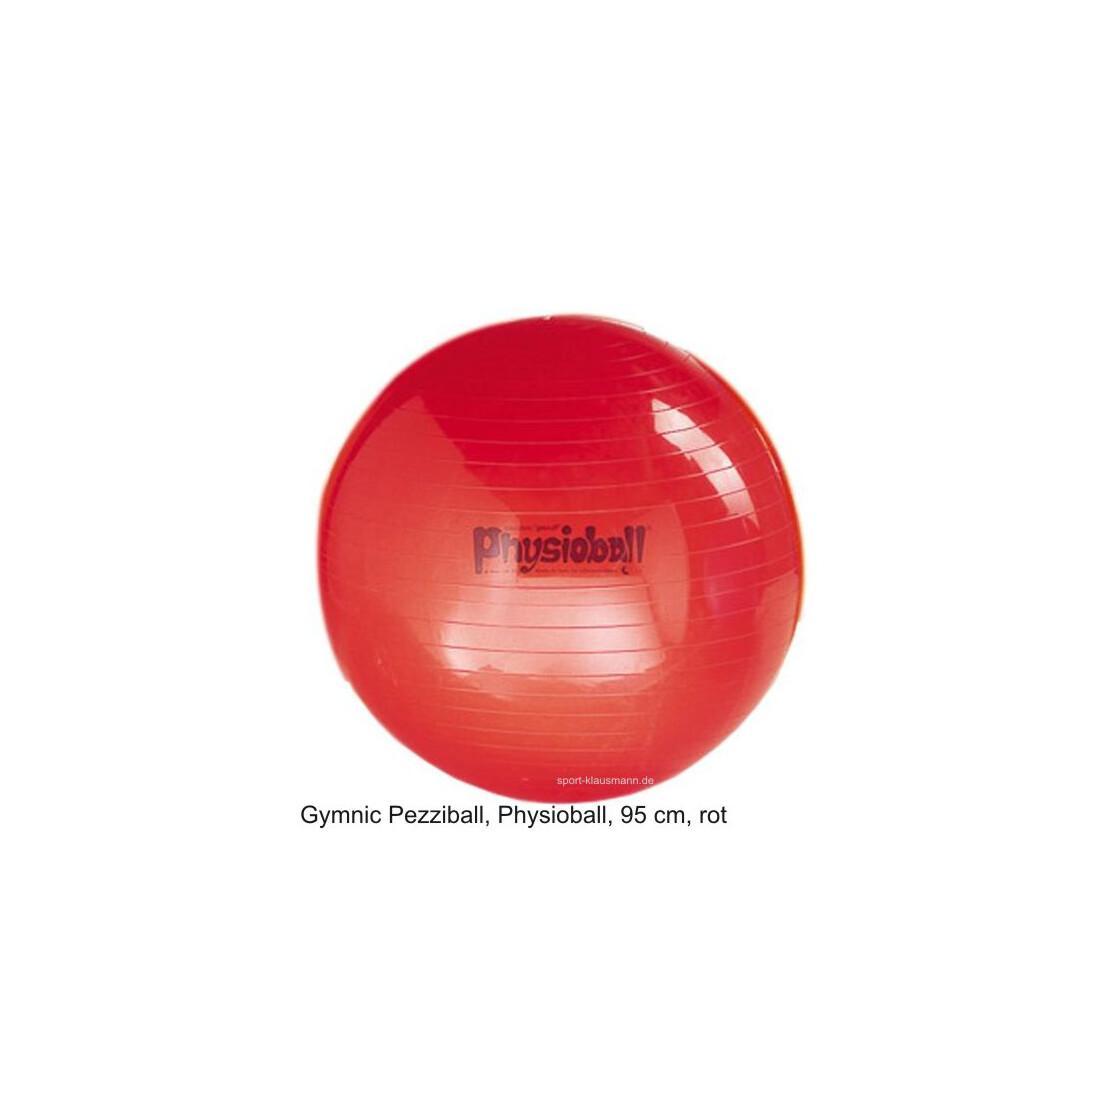 pezzi gymnastikball physioball sitzball 95 cm rot outdoor ausr. Black Bedroom Furniture Sets. Home Design Ideas